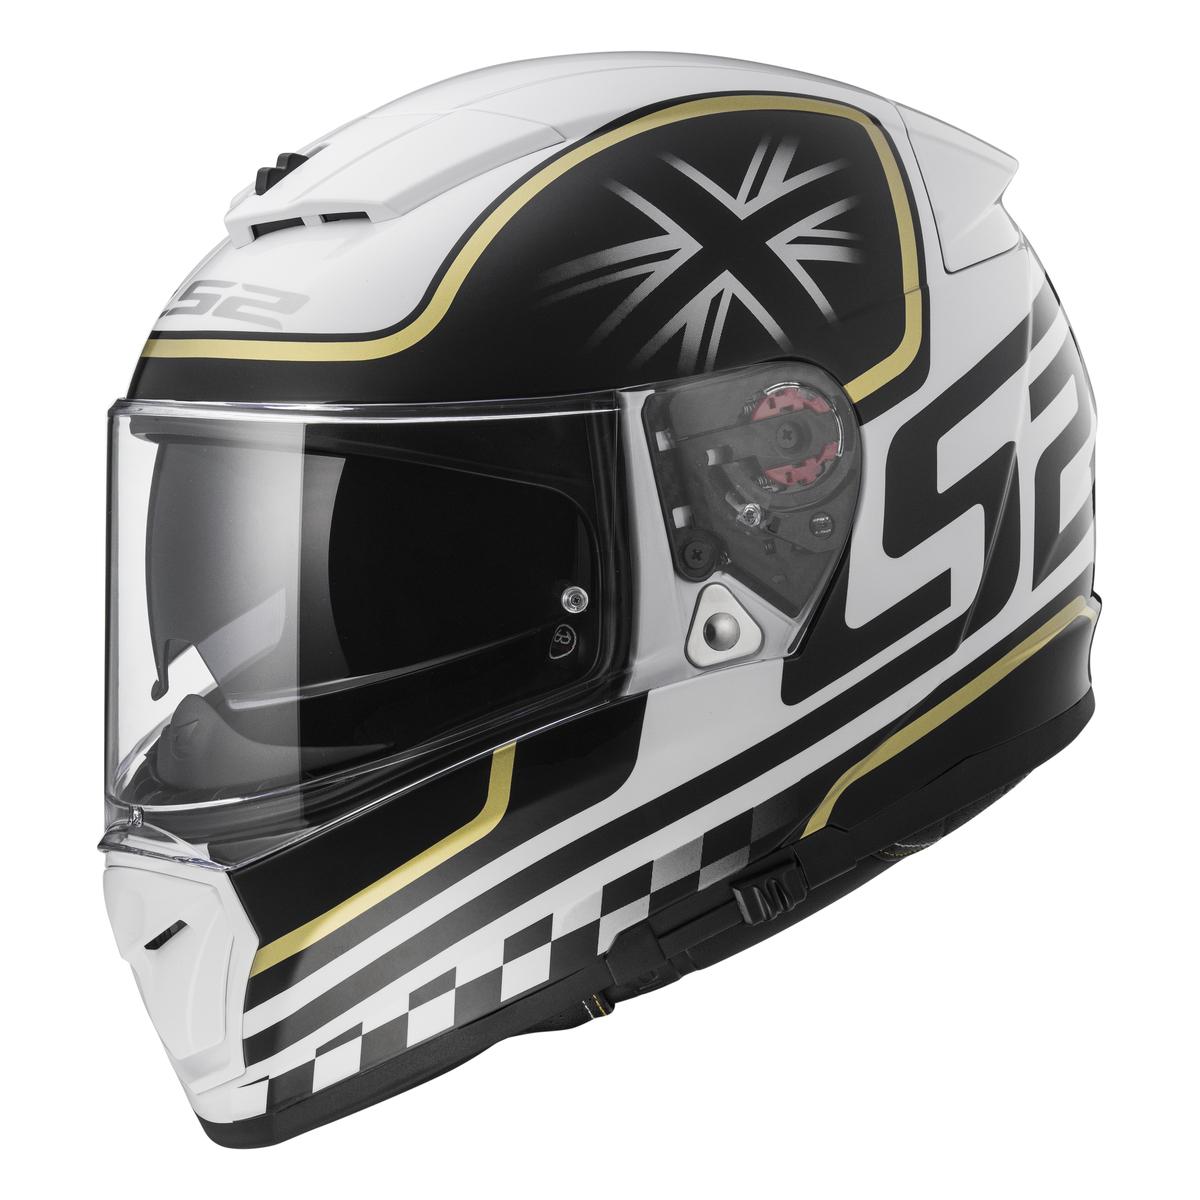 Breaker Classic Helmet